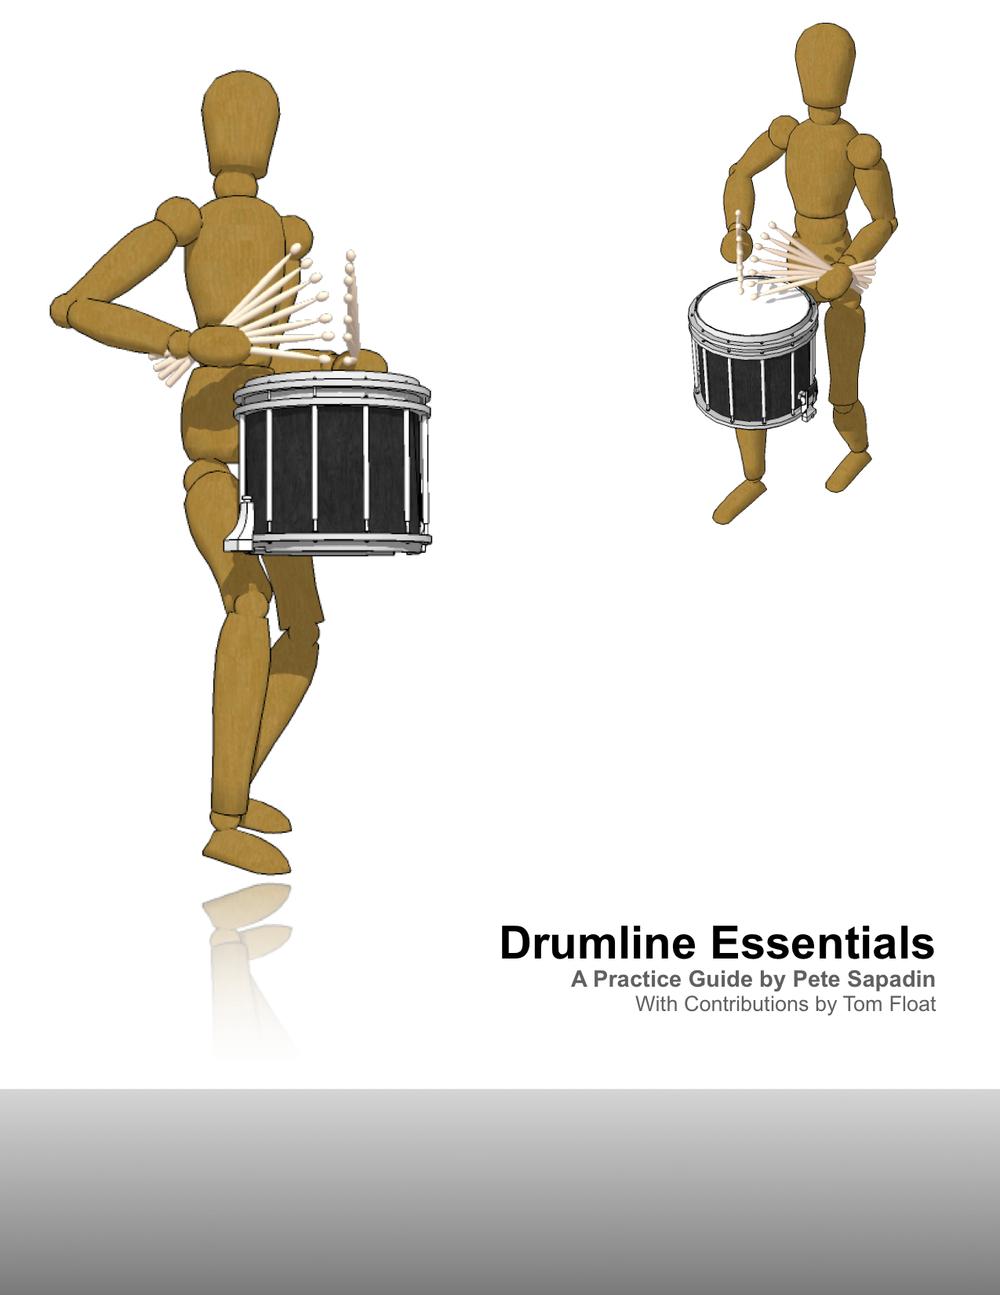 Drumline Essentials - Original Cover.png